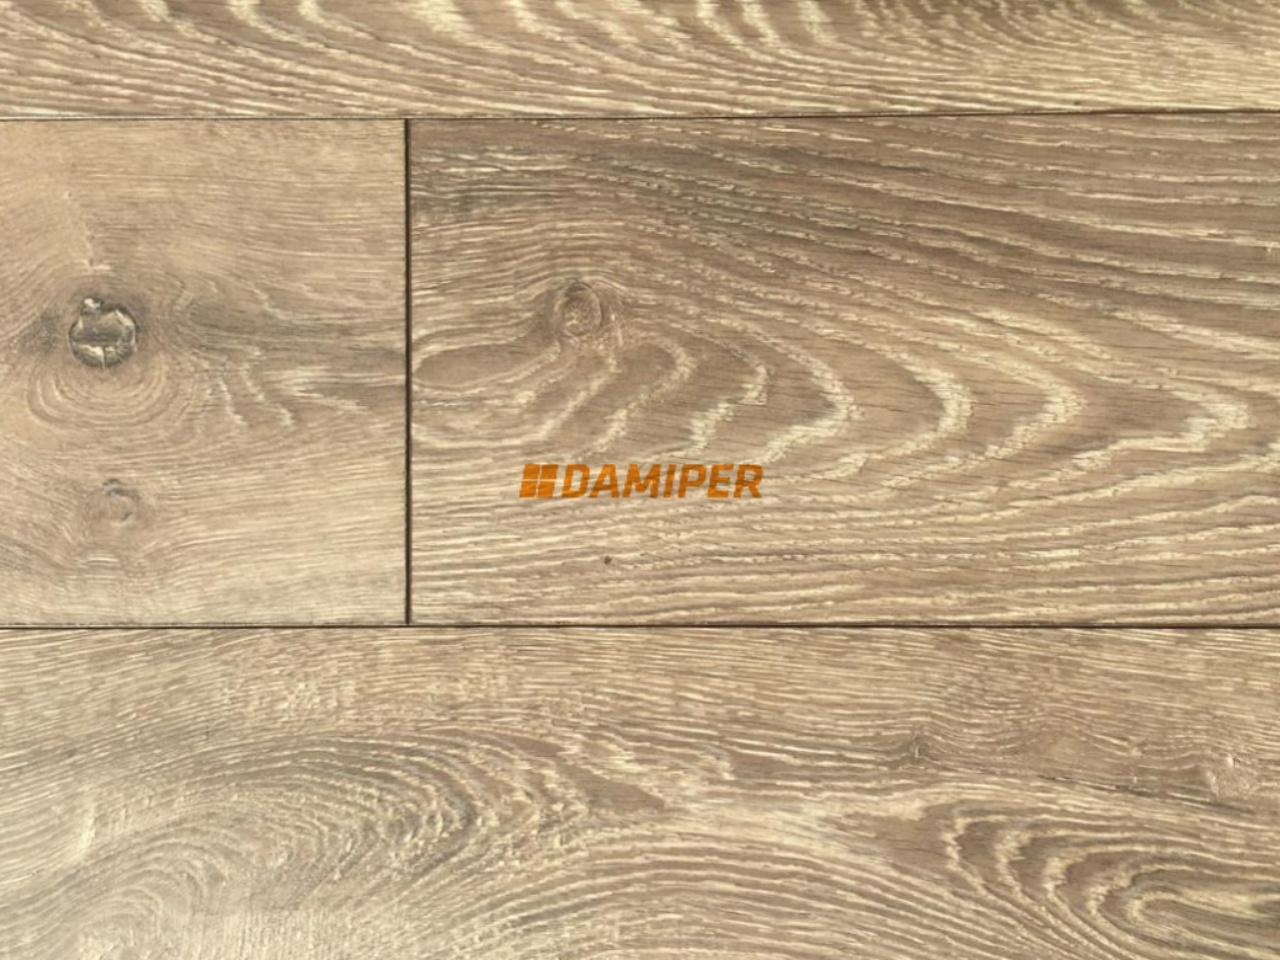 kompozitne_podlahy_h2o_floor_kronooriginal_1539_dub_liverpool_damiper